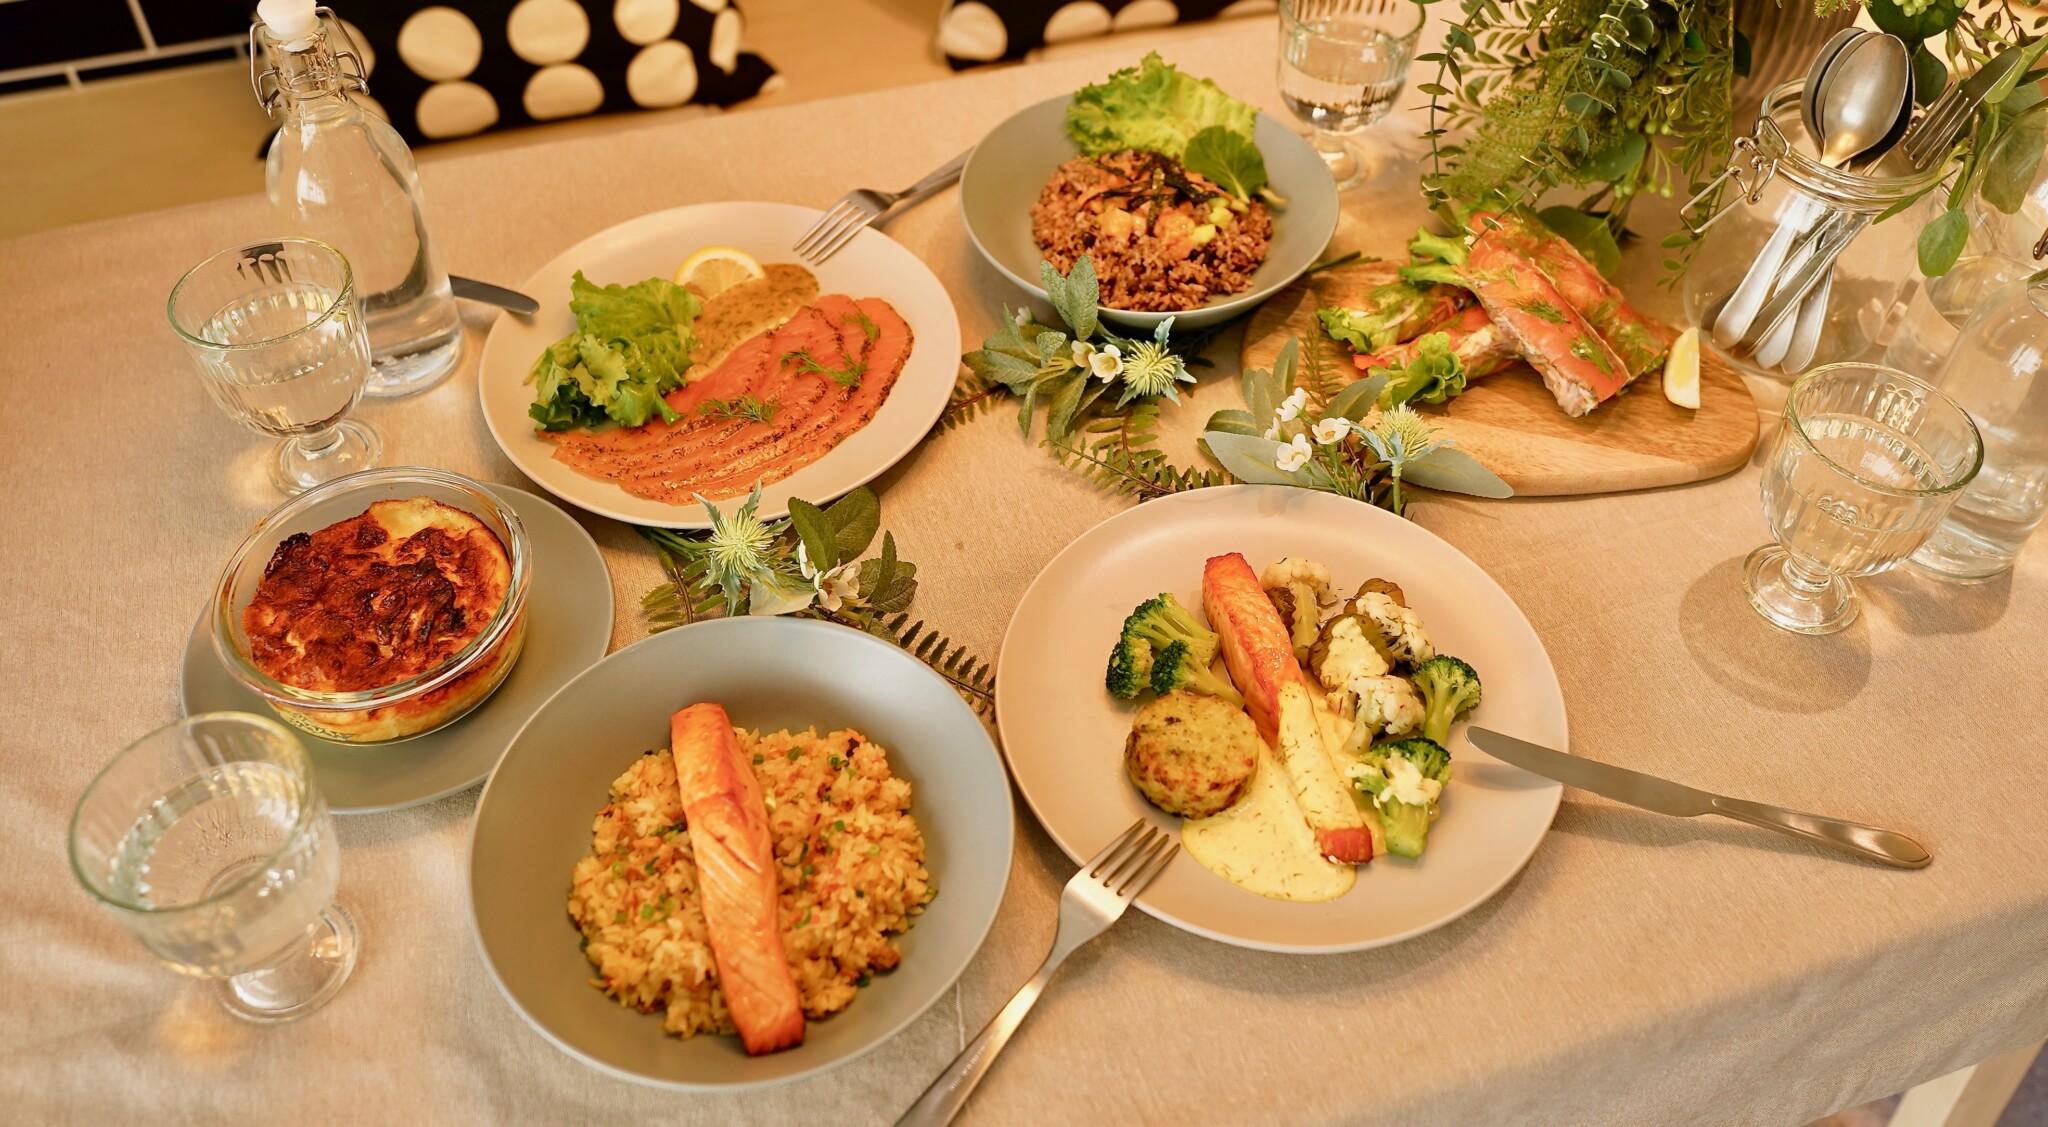 〈IKEA渋谷〉に都市型店舗初のスウェーデンレストランが誕生。渋谷限定サーモン・プレートが大漁!